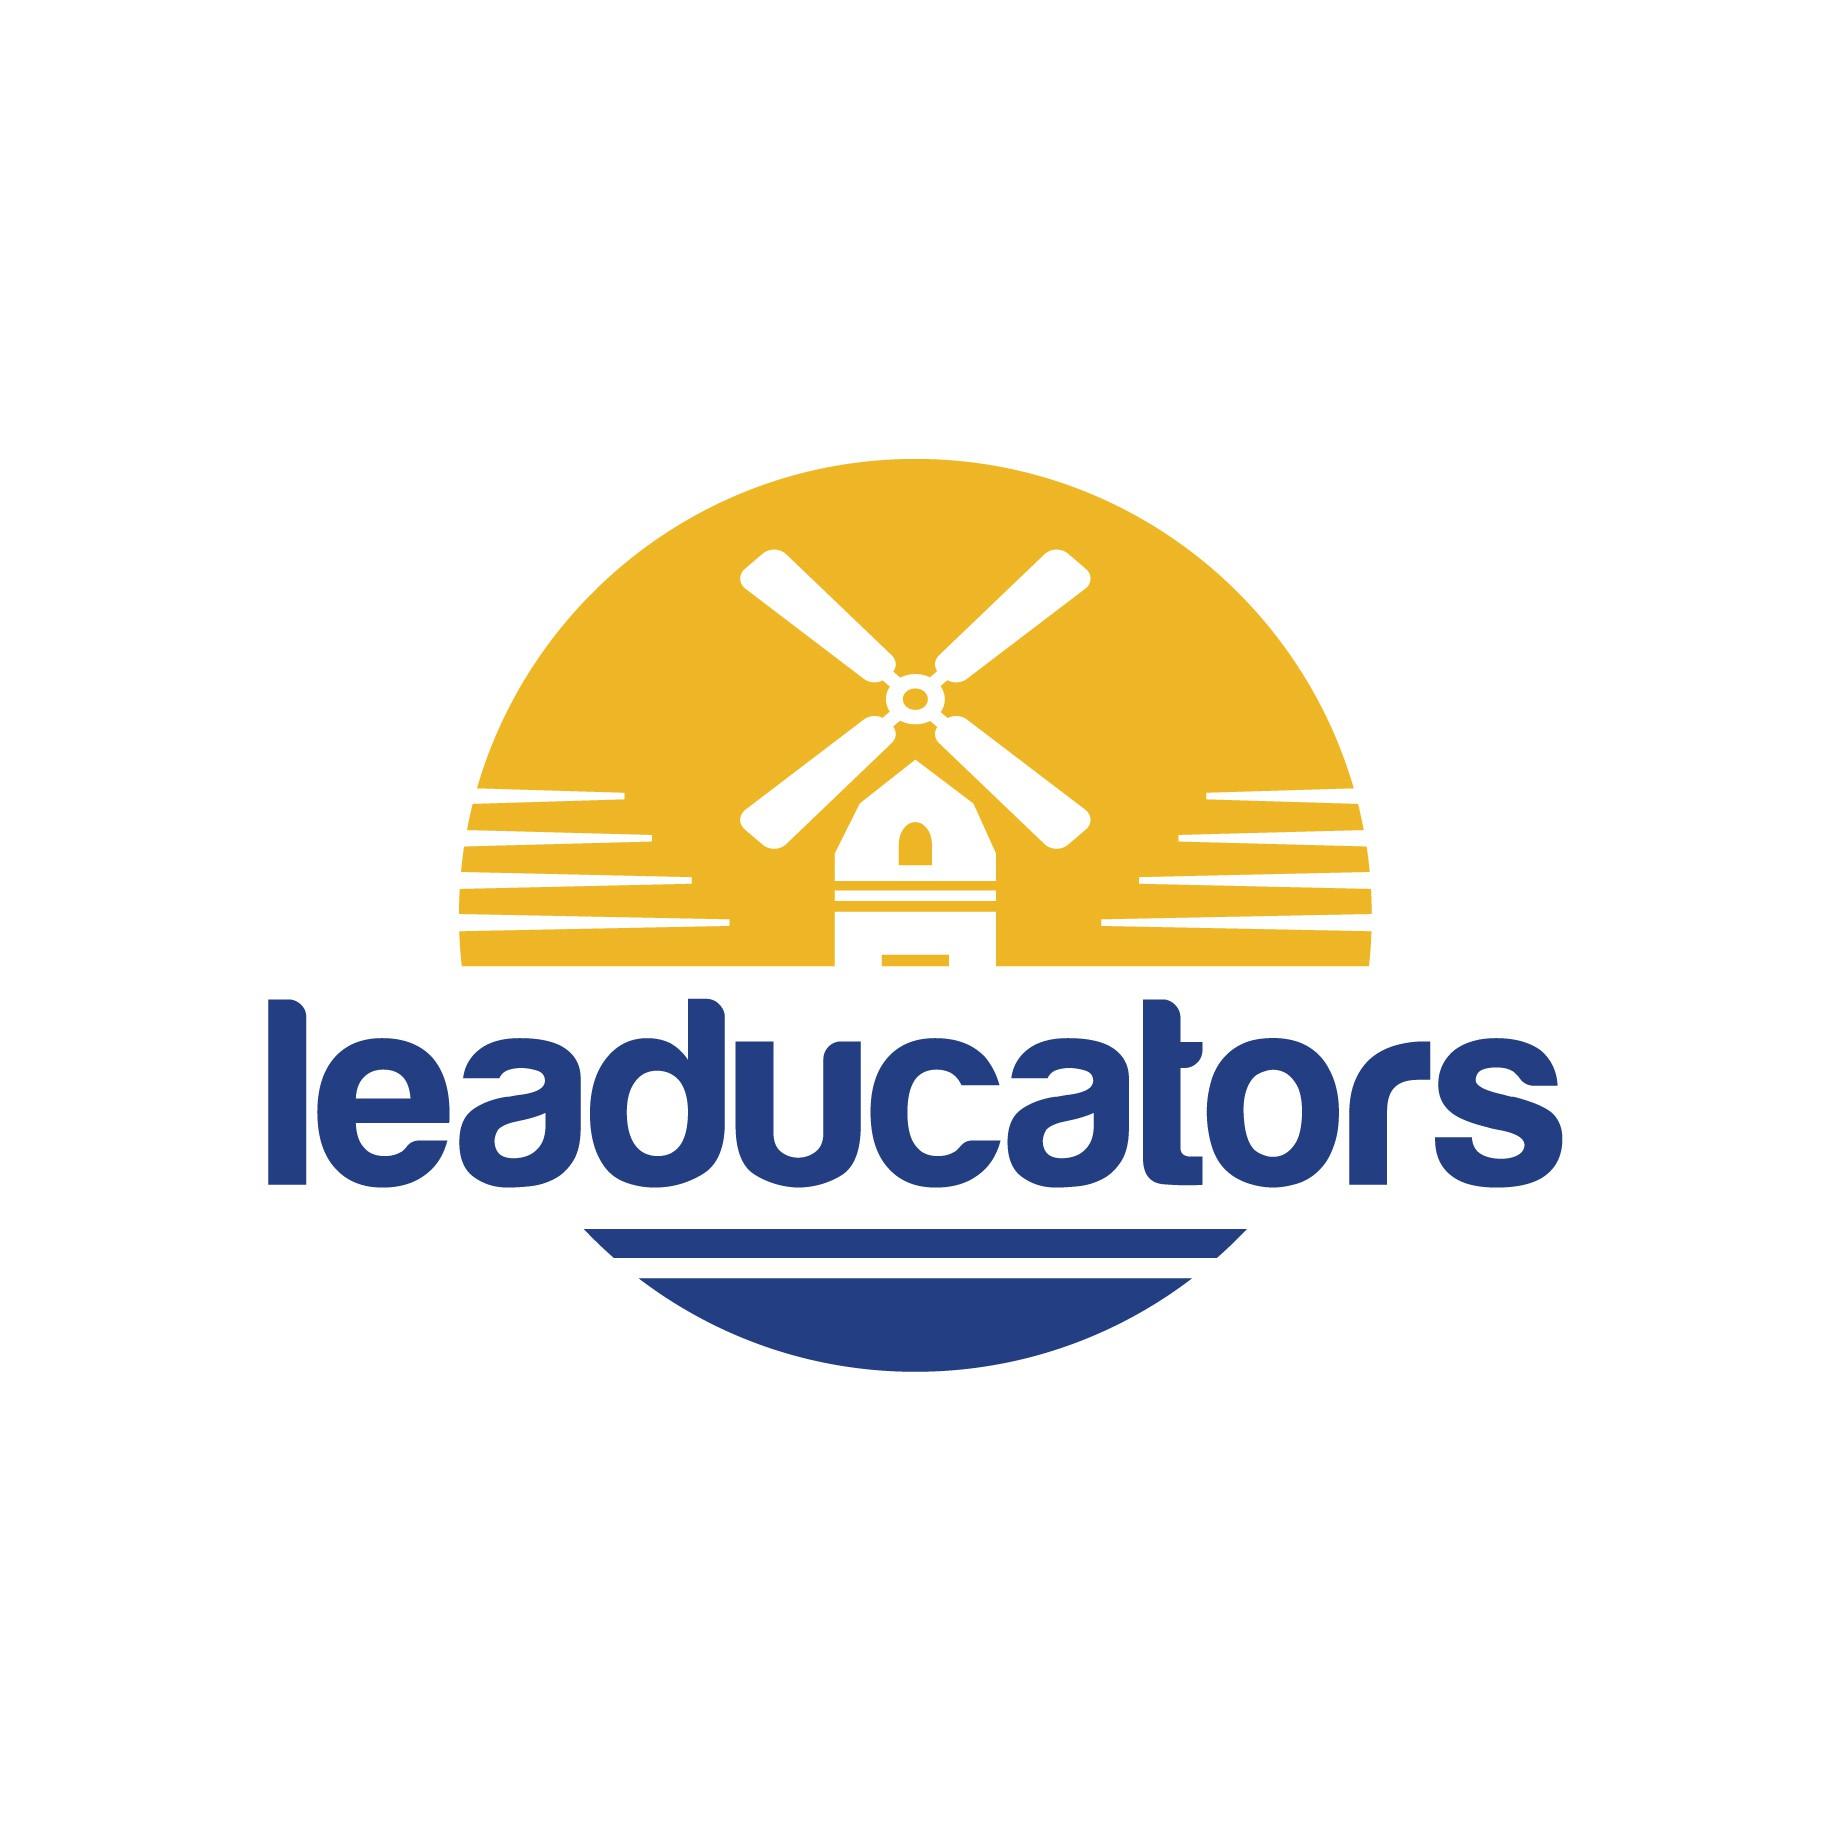 Creative & engaging logo for leadership training program